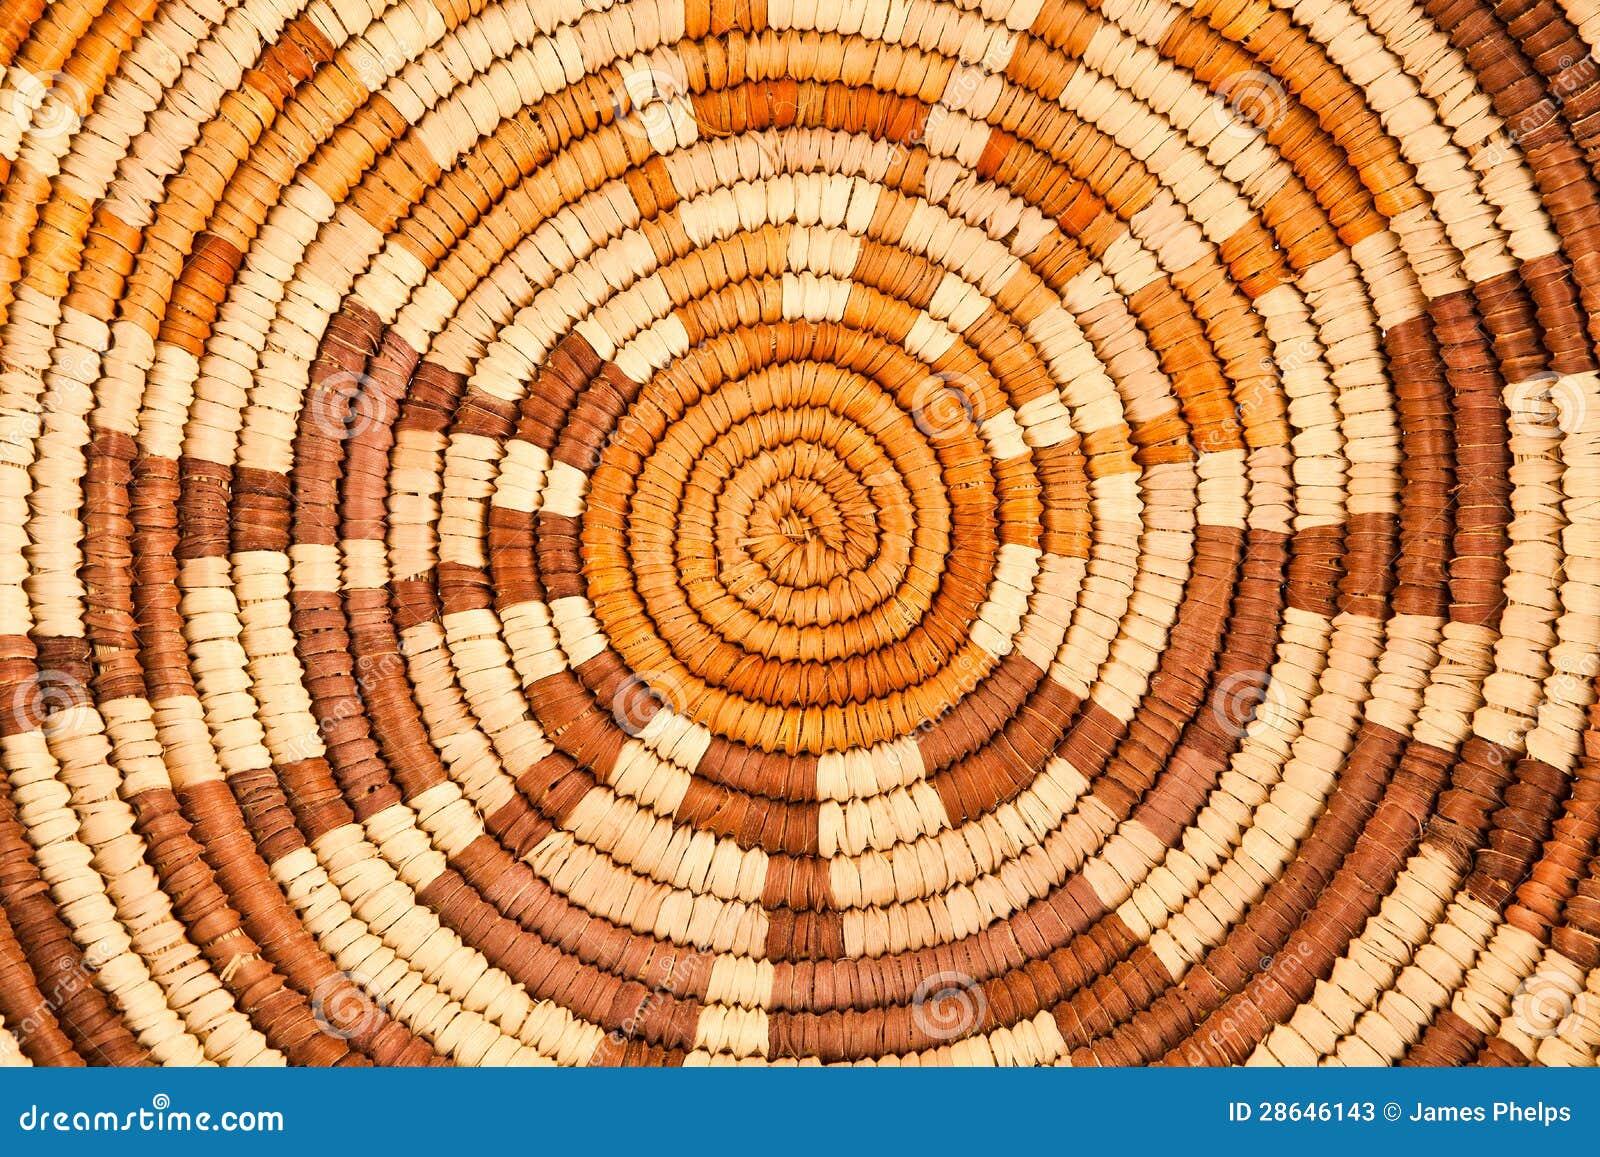 Indian tribal patterns